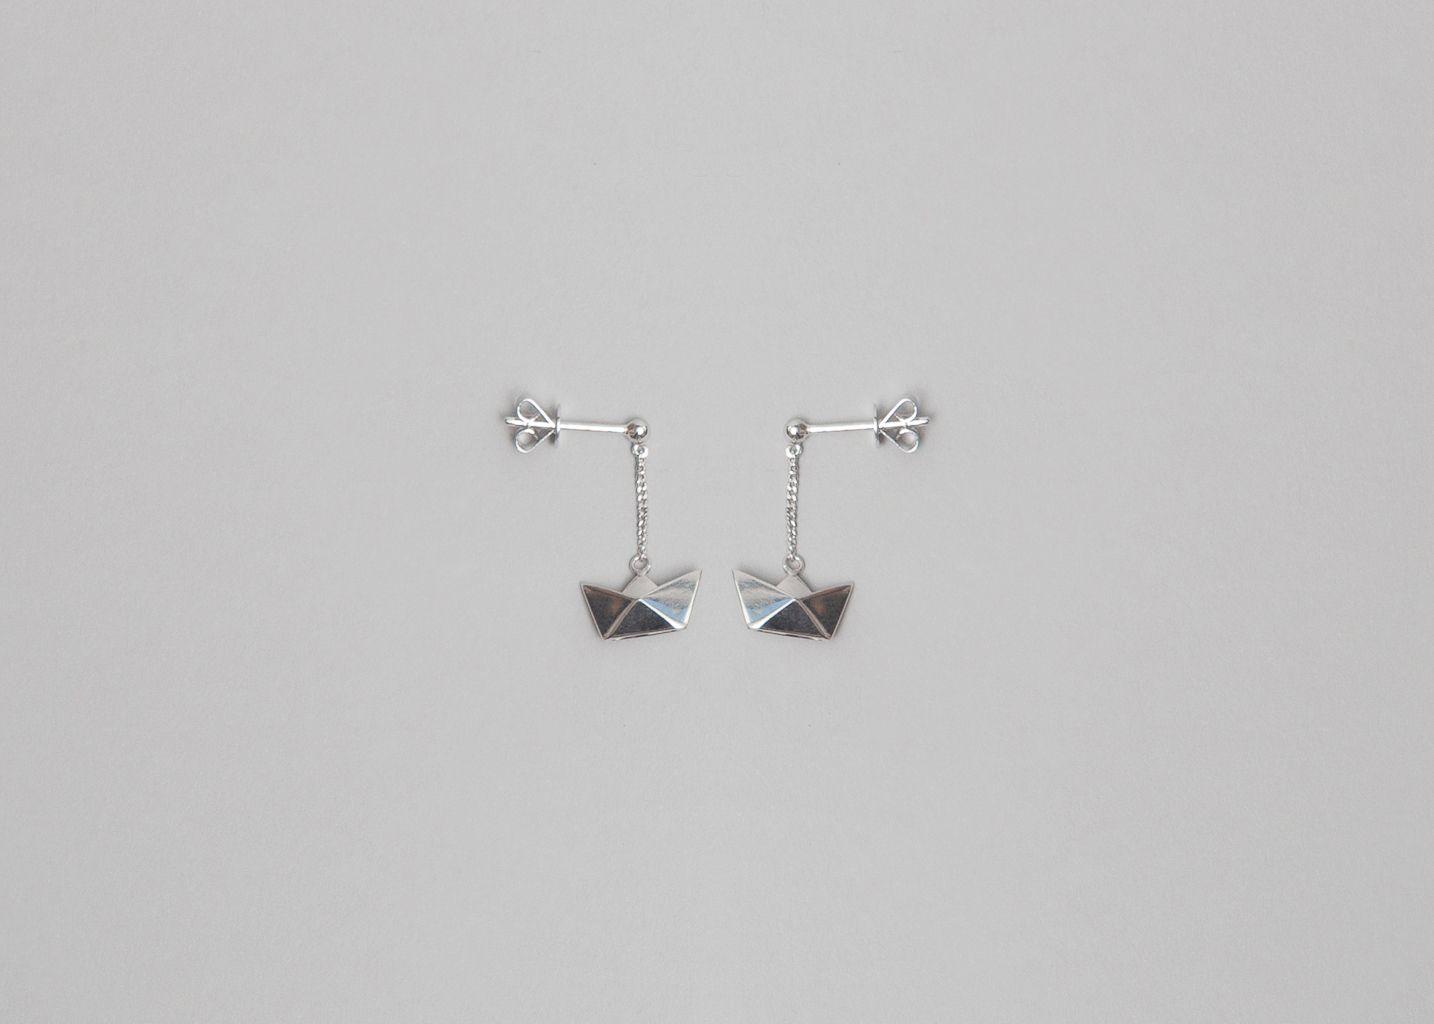 Boucles d'Oreilles Bateau Origami - Origami Jewellery